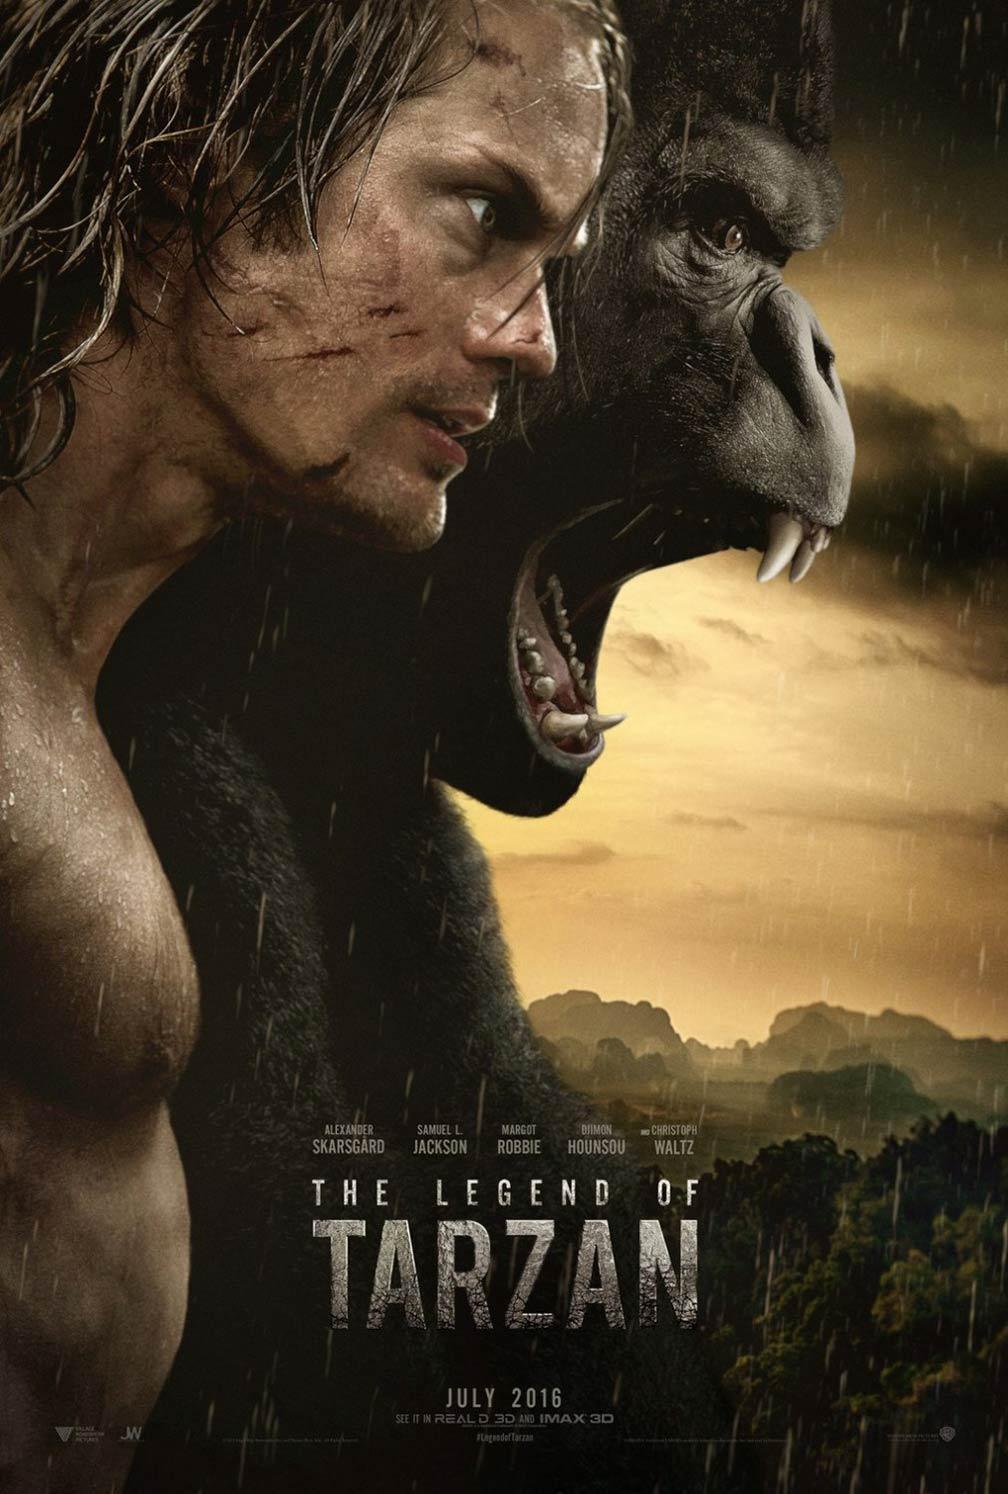 [The Legend of Tarzan poster]